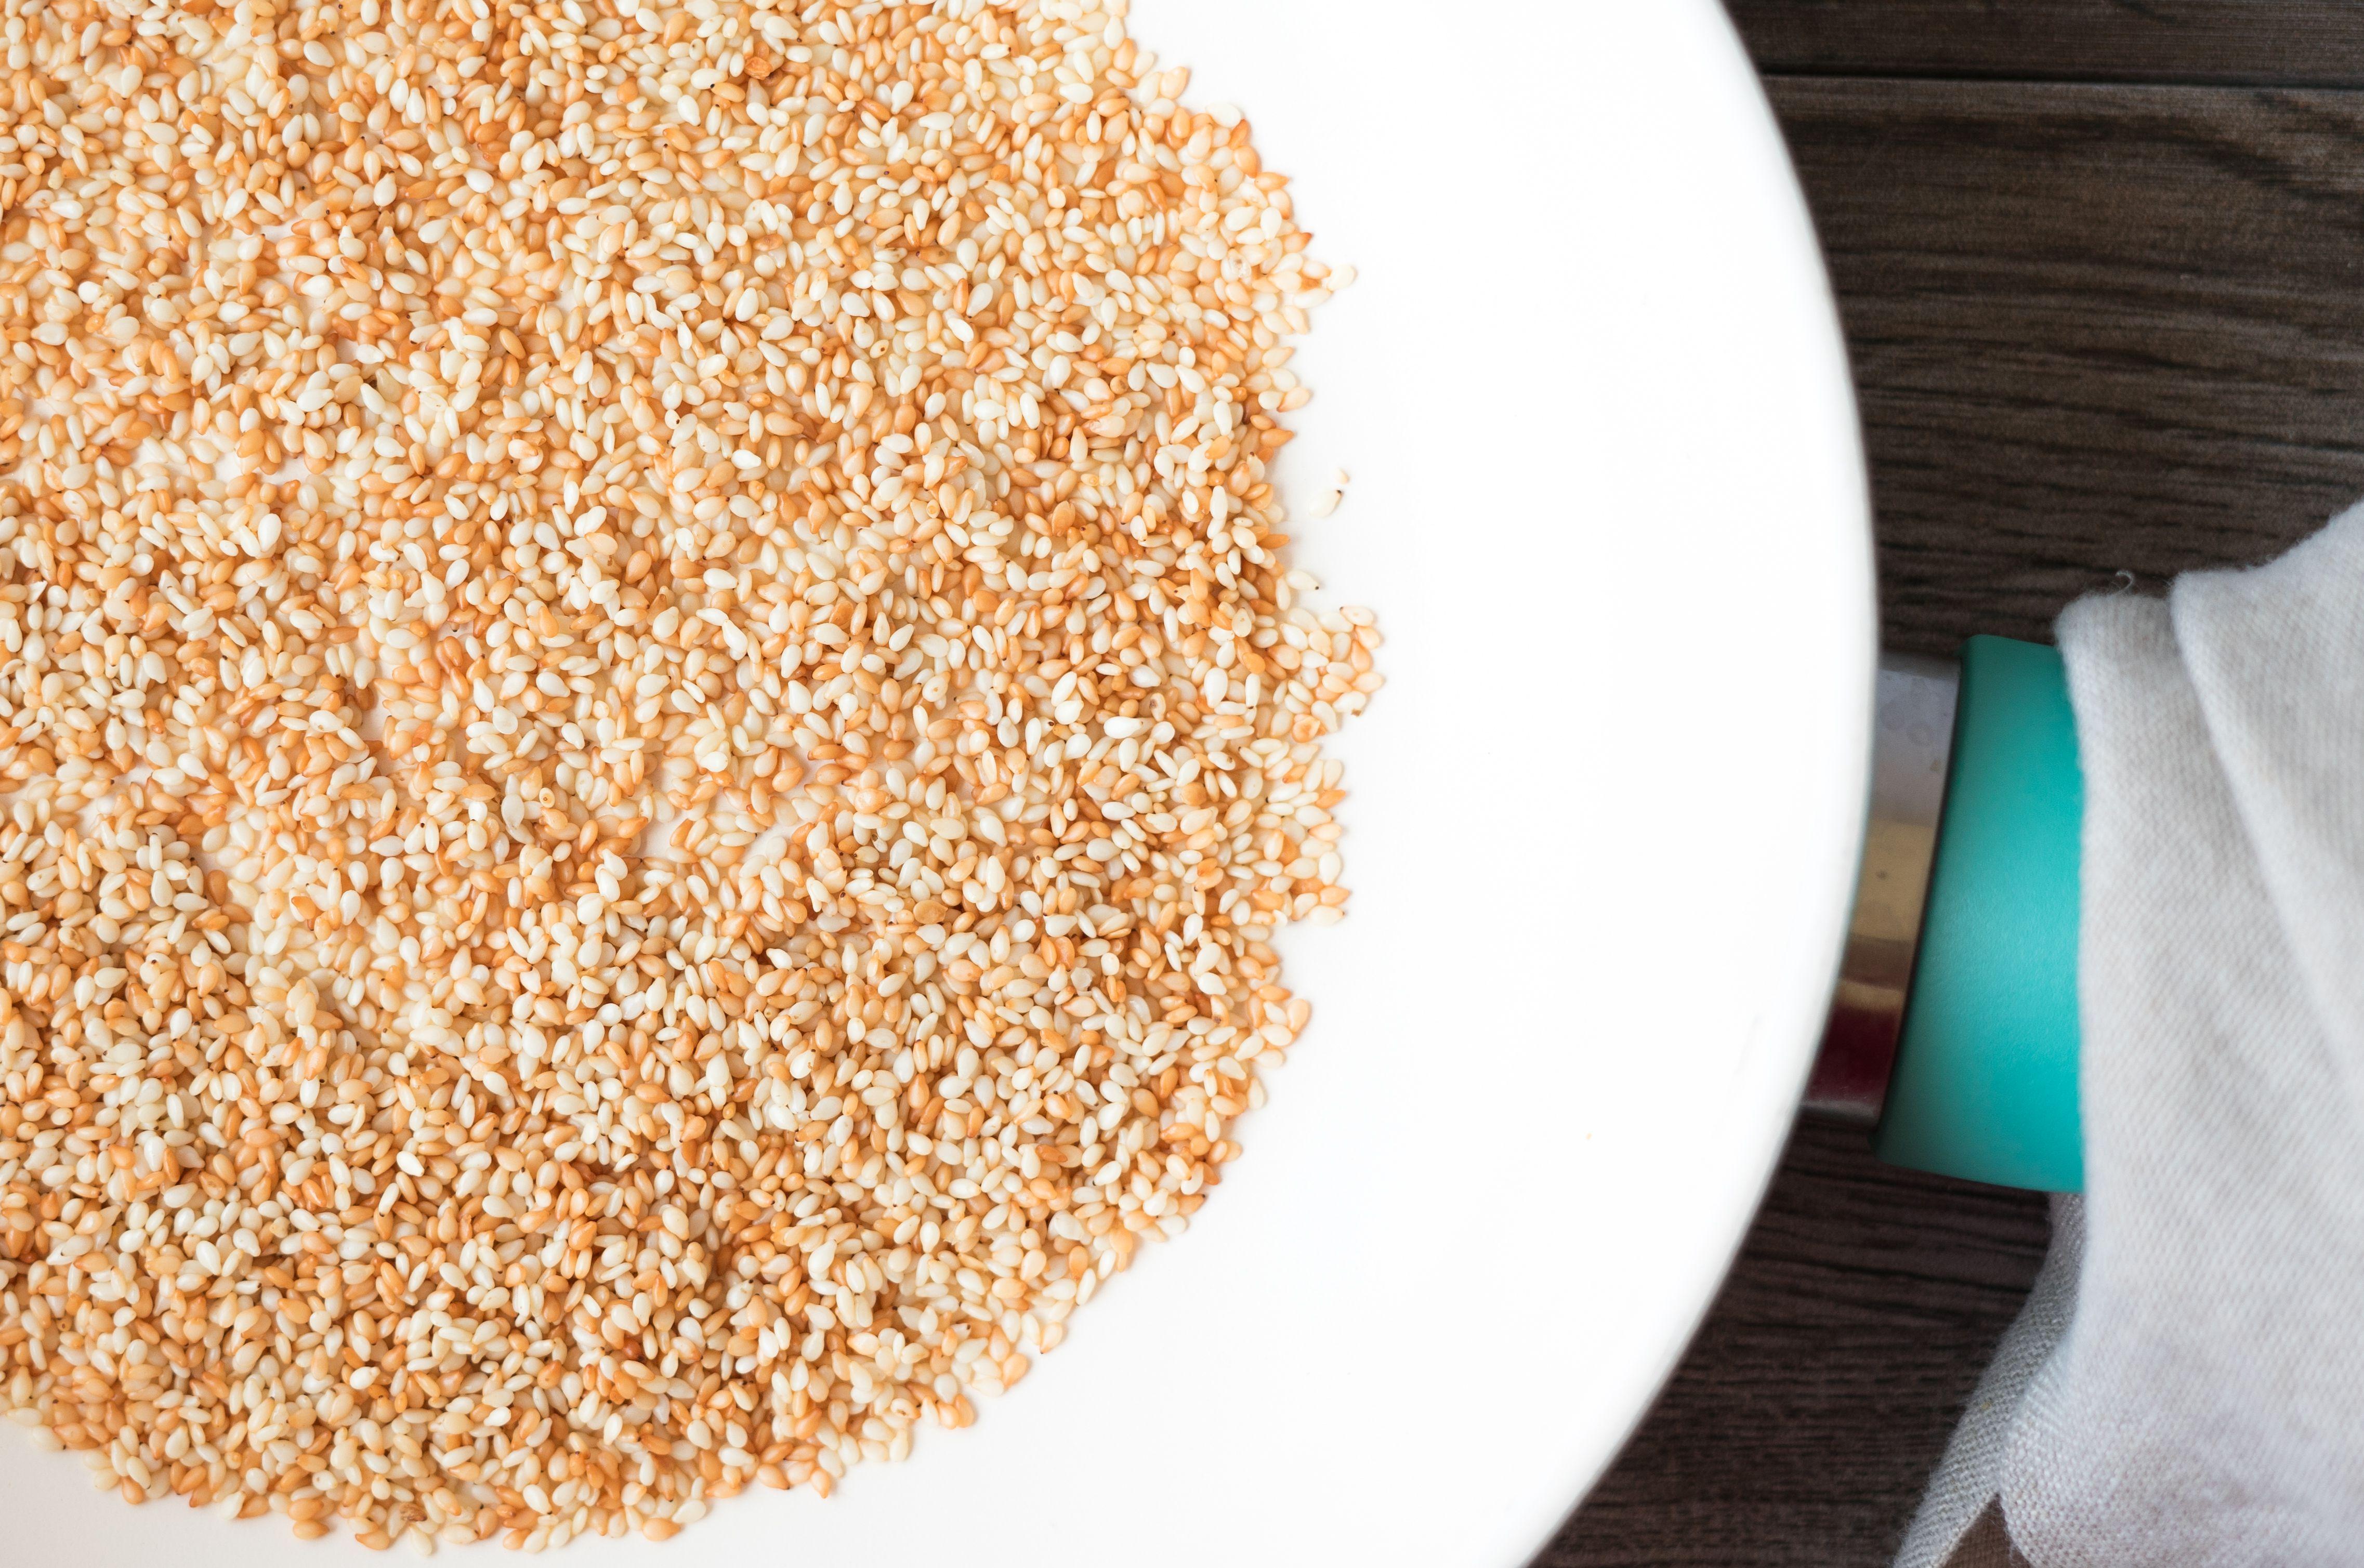 Sesame seeds in a pan